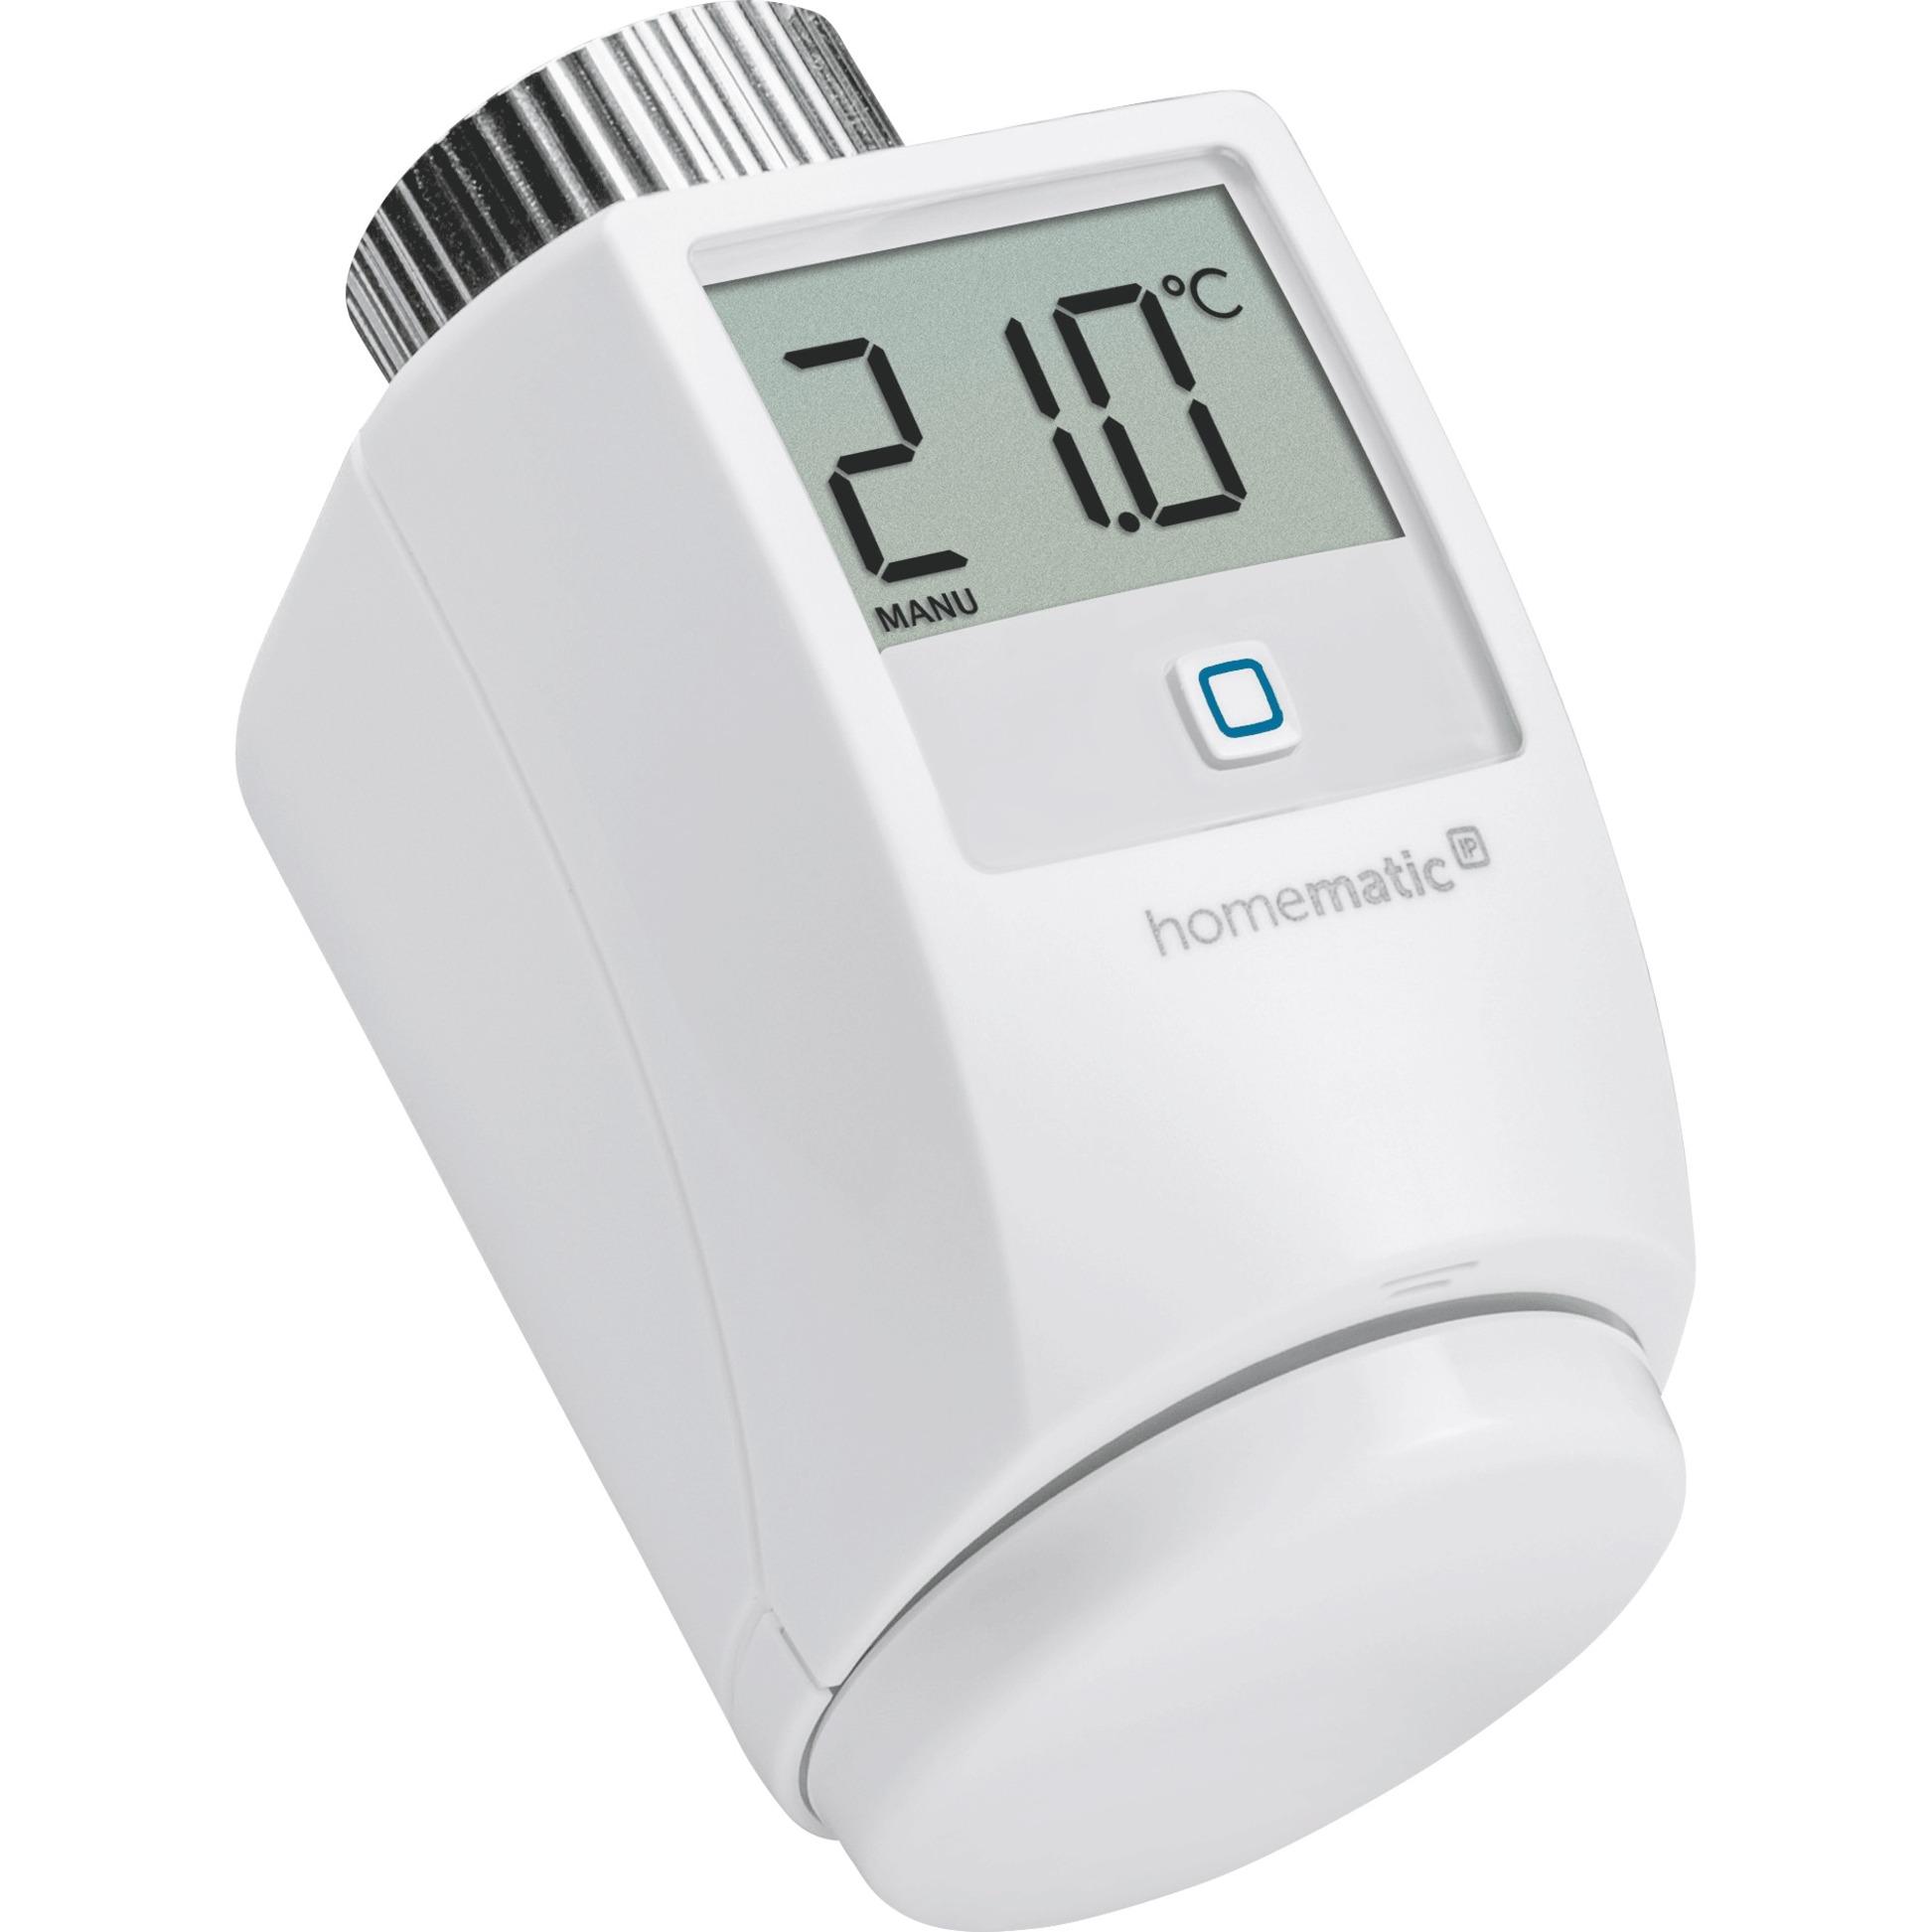 Honeywell termostato digital programable semanal - Termostato digital precio ...